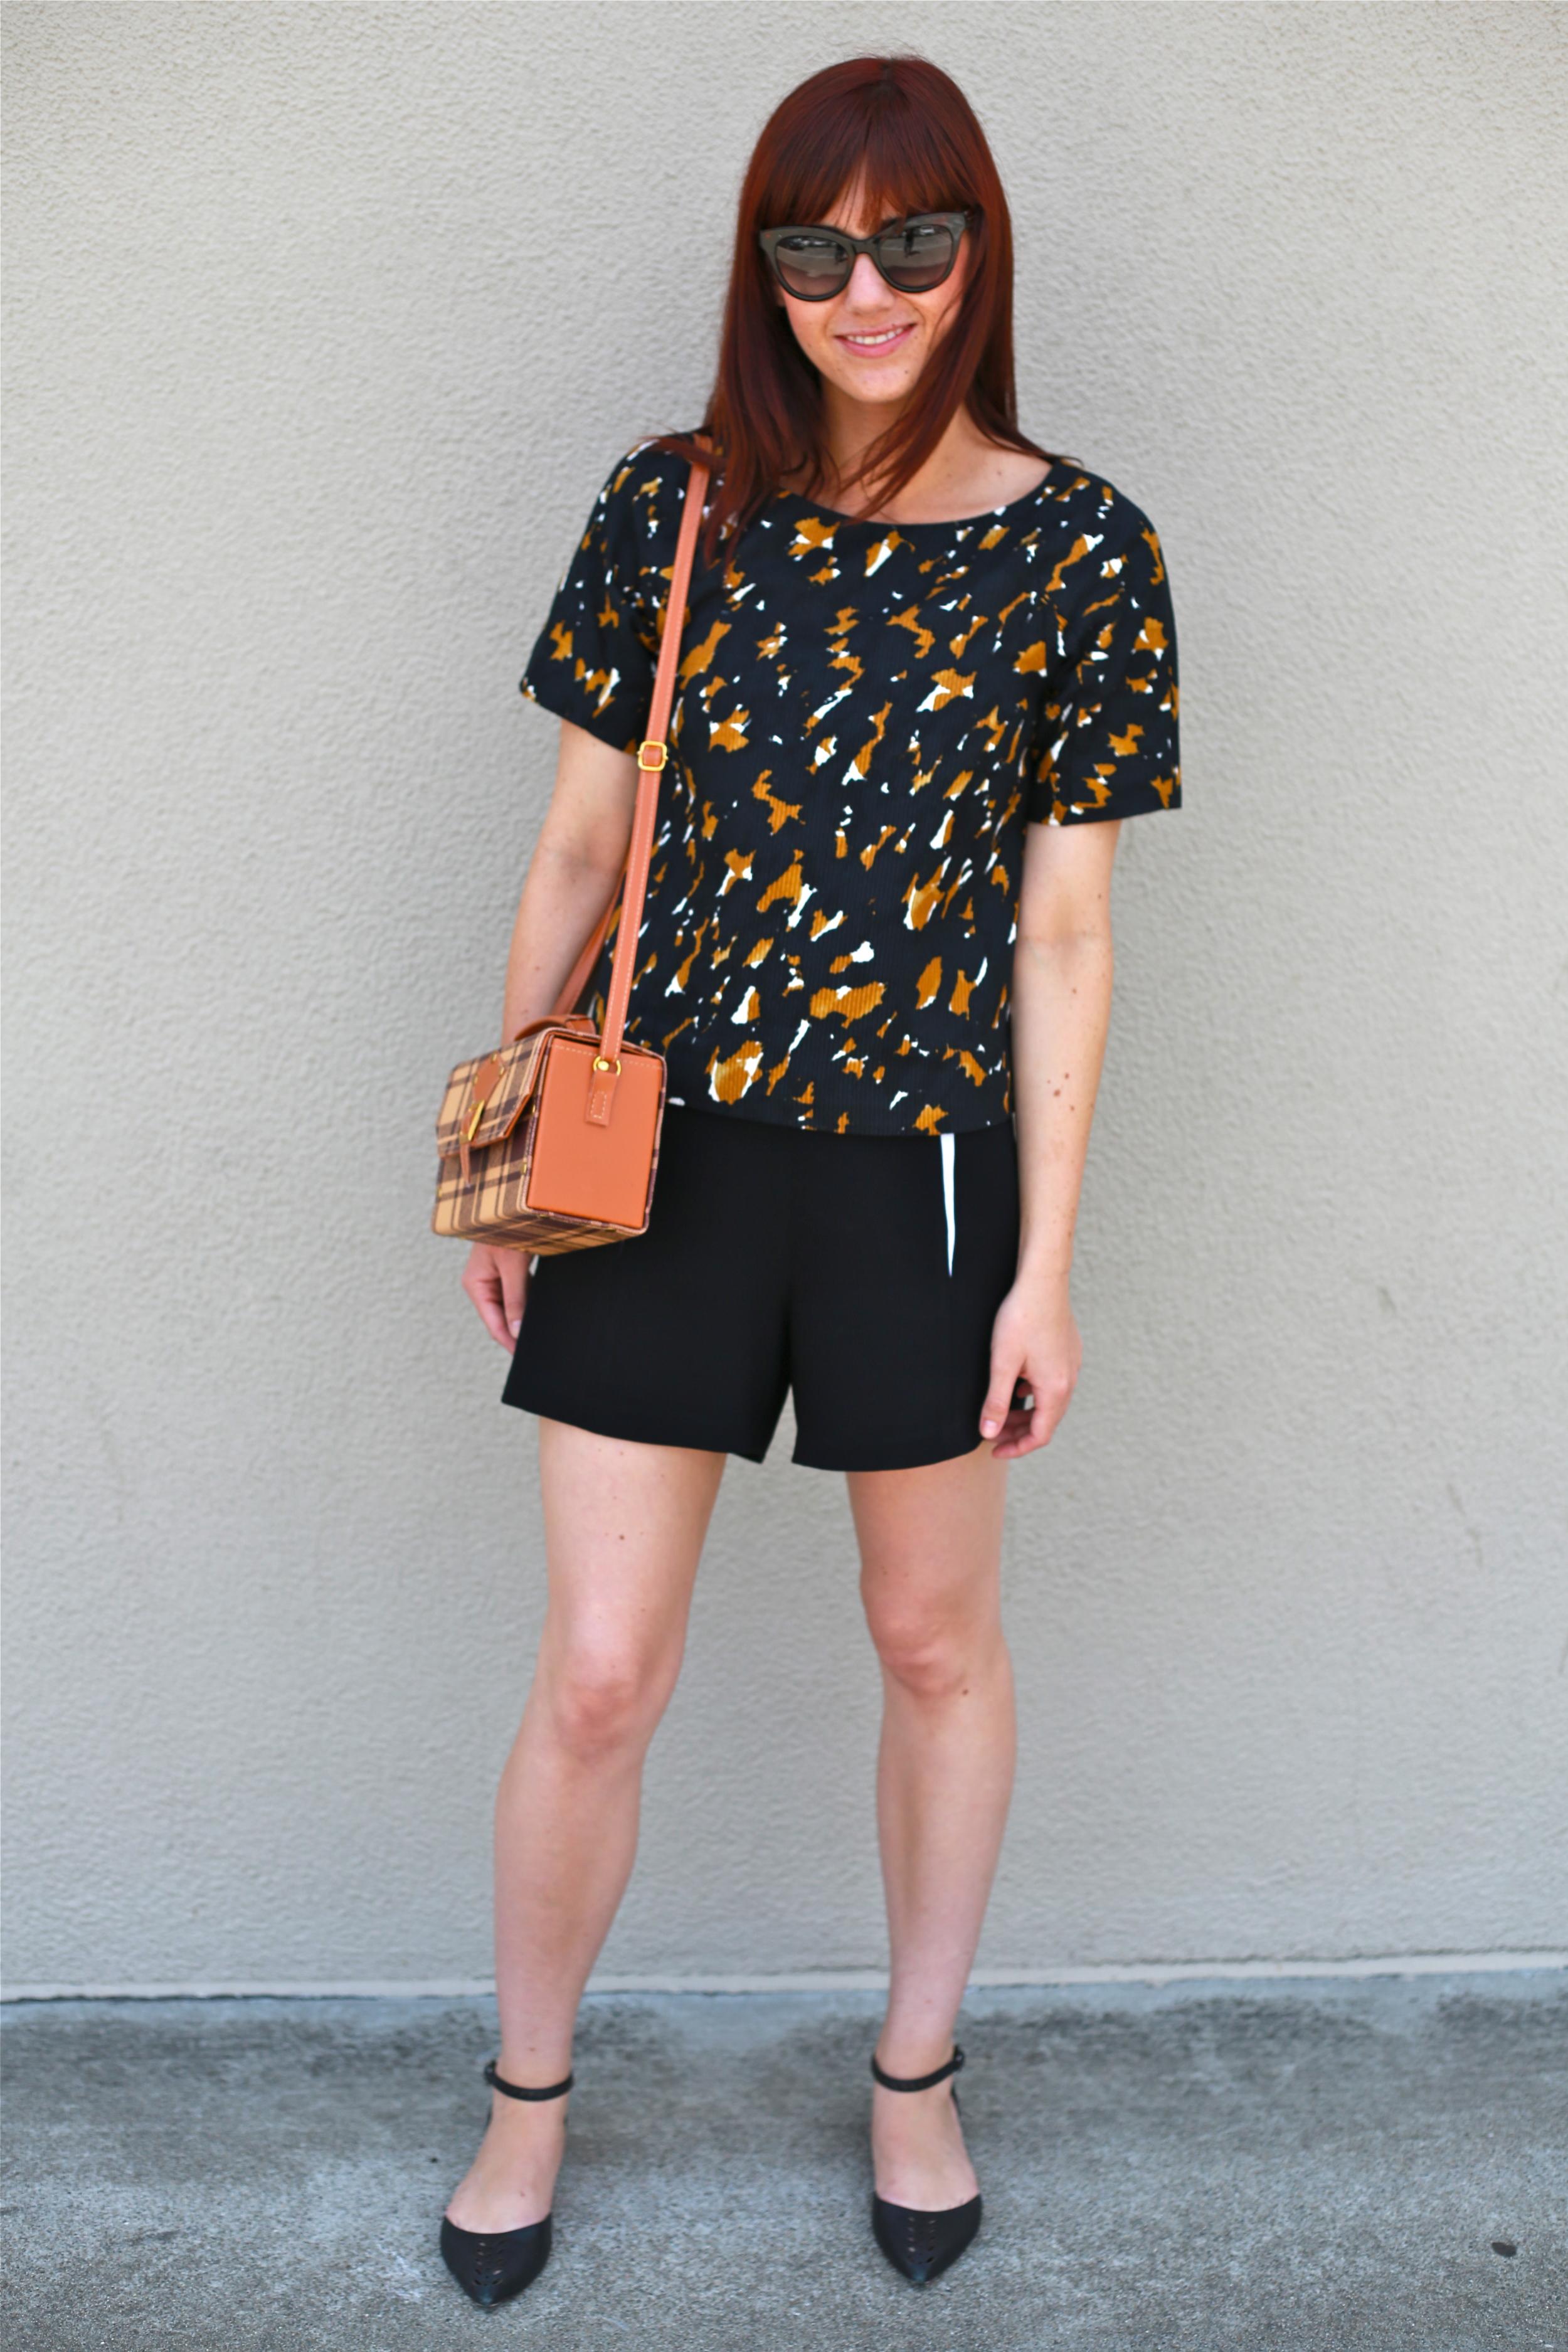 Shirt : Jigsaw London;  Florencia Shorts : Rag & Bone, Loft; Flats: Via Spiegel, Nordstroms Rack; Sunnies: Marc by Marc Jacobs